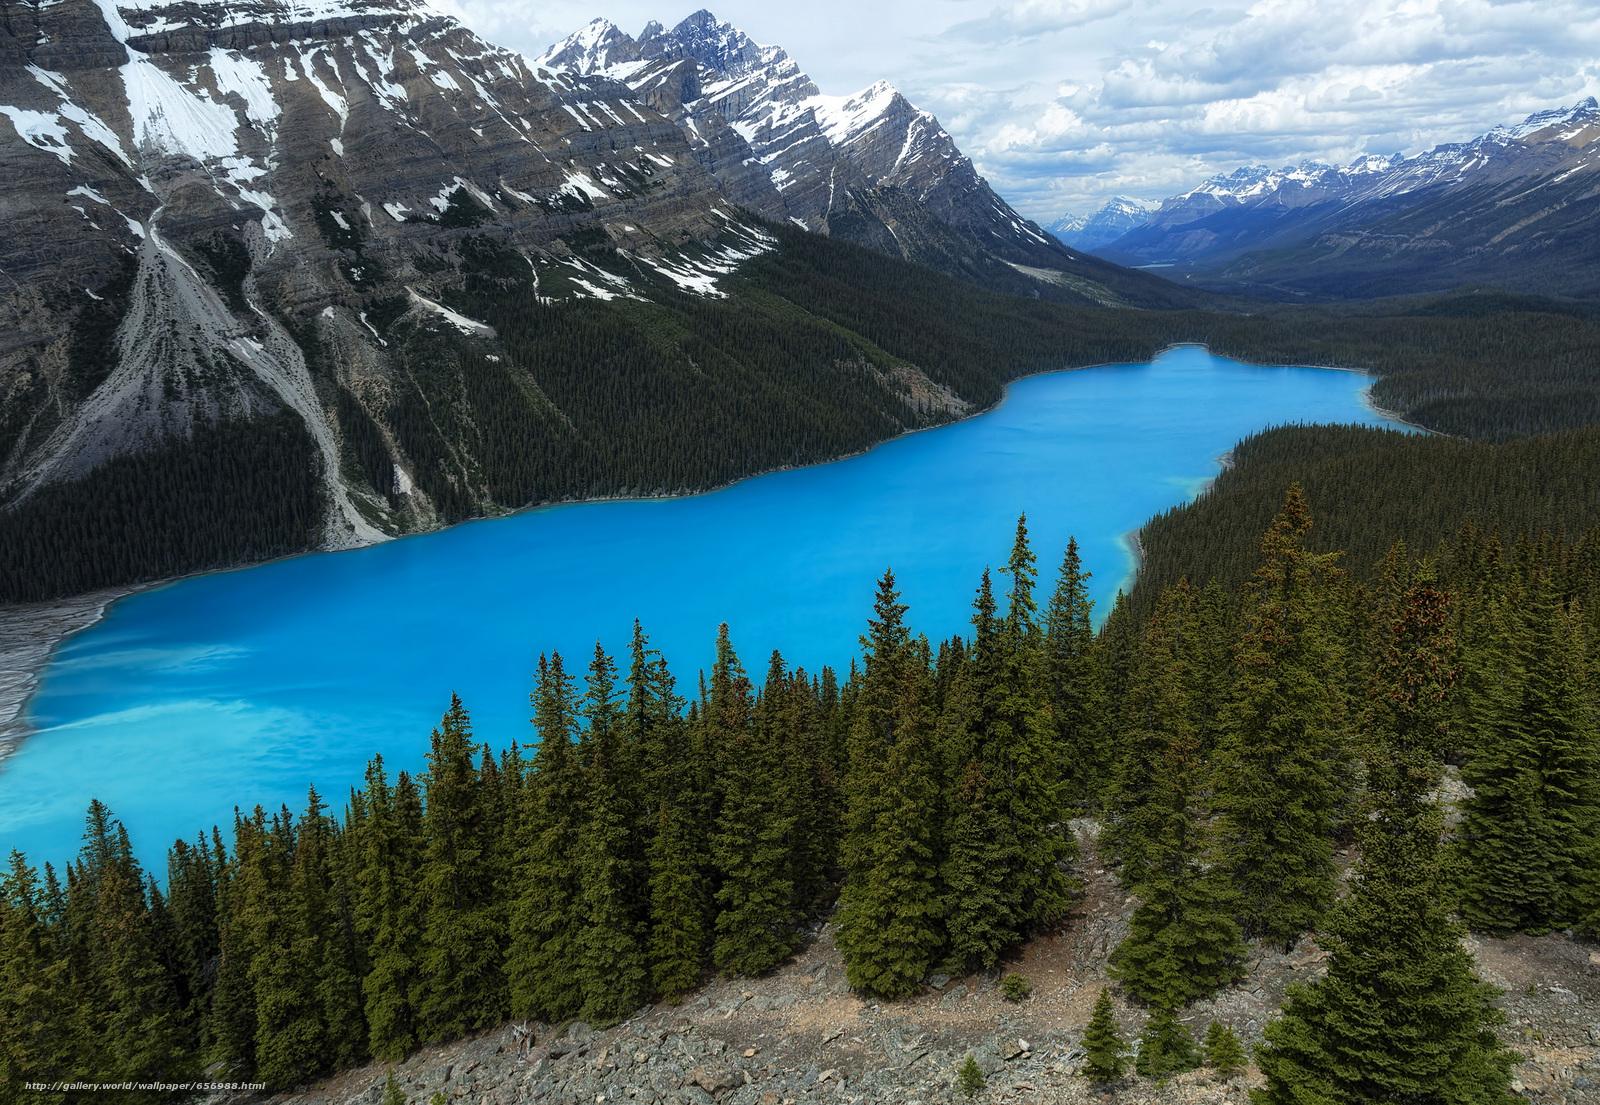 Download wallpaper Peyto Lake,  Banff National Park,  Alberta,  Canada free desktop wallpaper in the resolution 2048x1414 — picture №656988